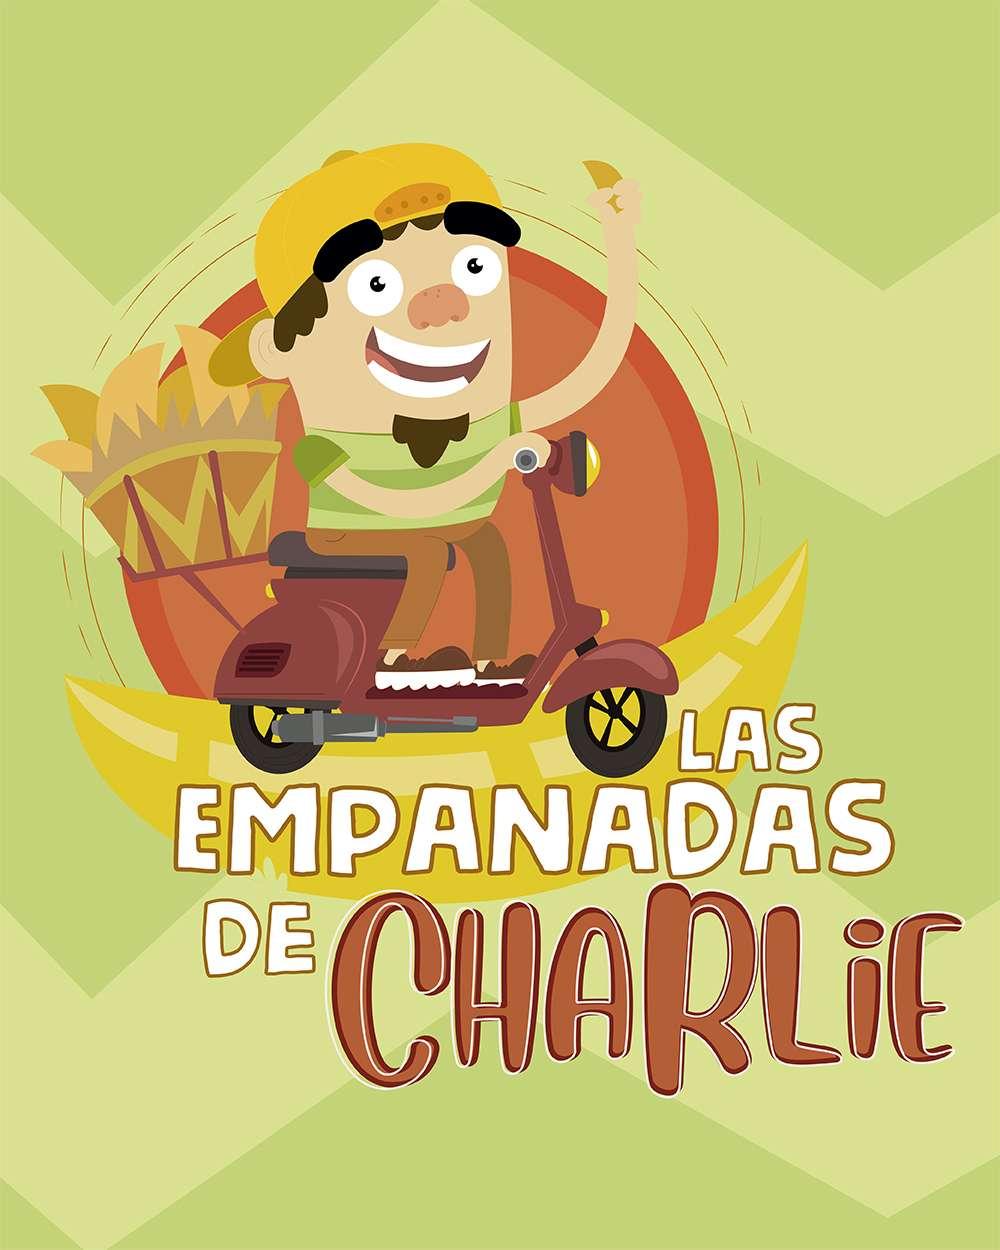 Las Empanadas de Charlie